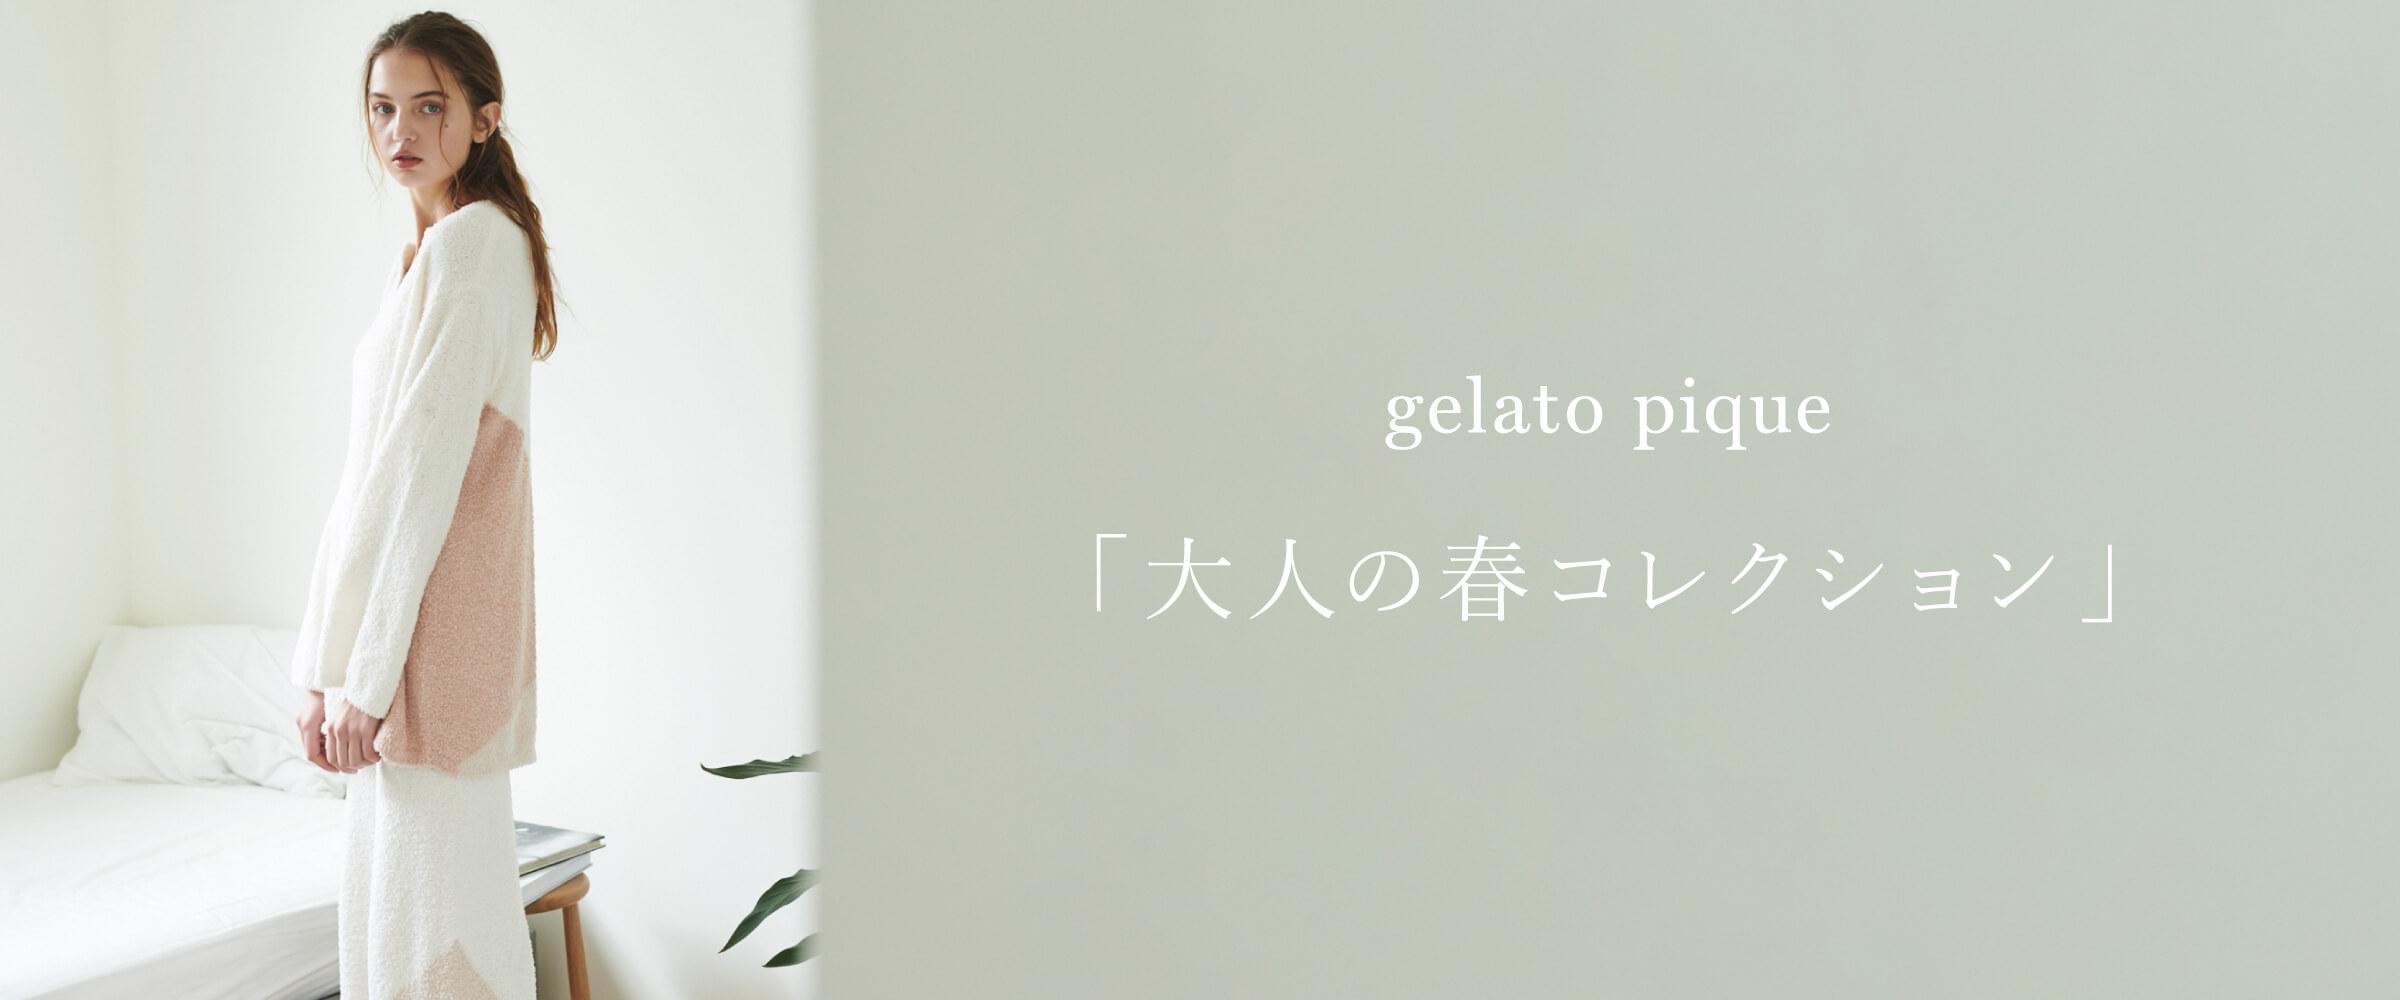 gelato pique「大人の春コレクション」